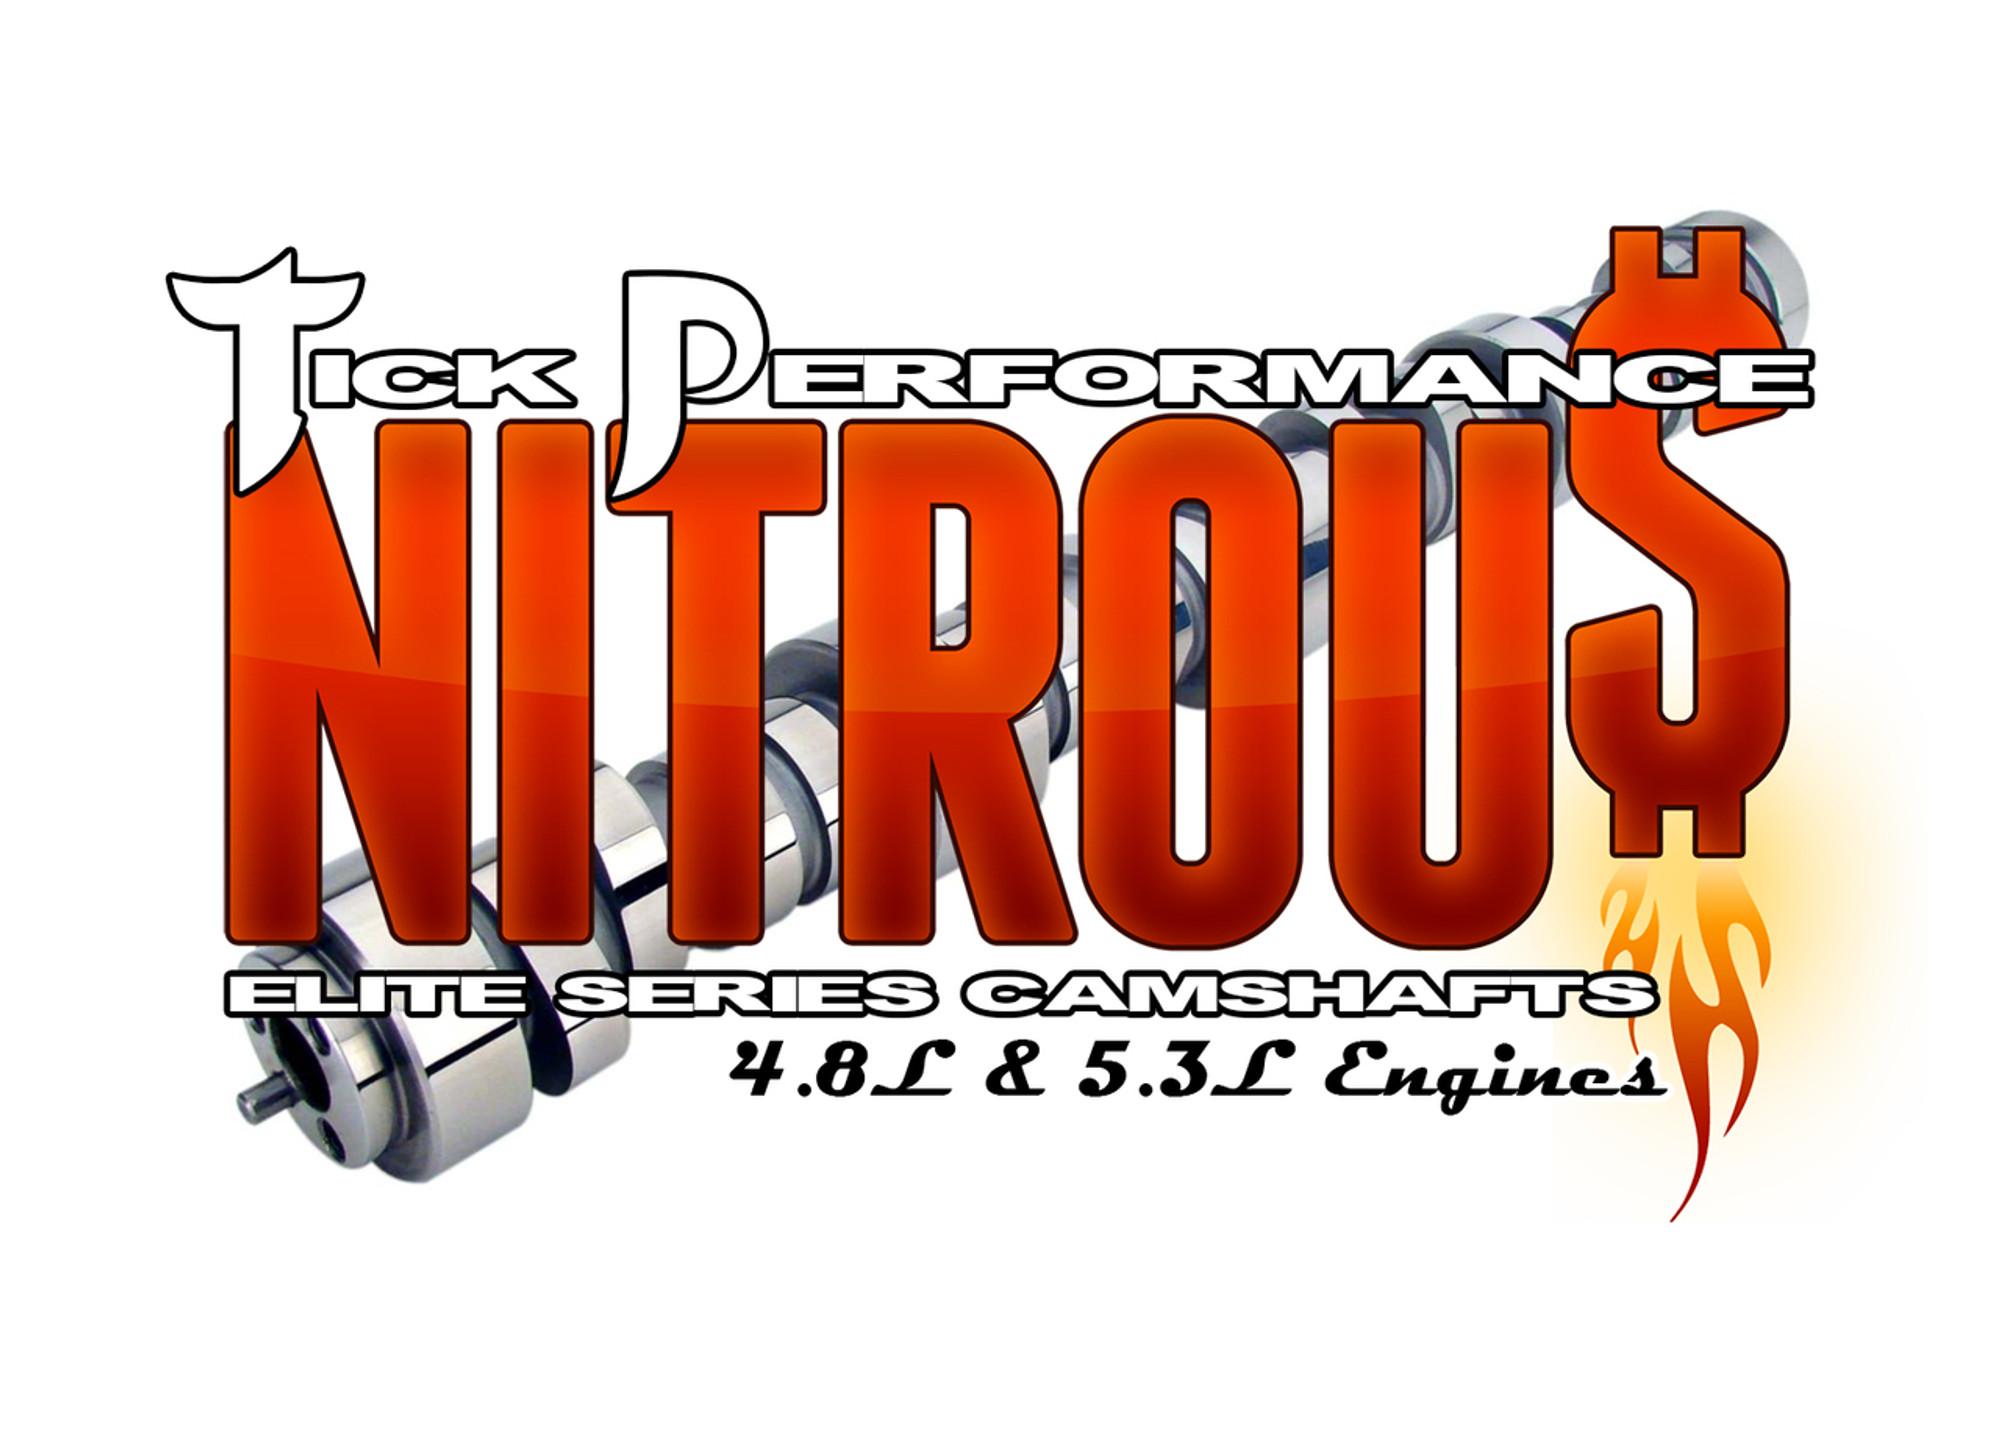 Tick Performance NITROU$ Camshaft for 4 8L & 5 3L Engines